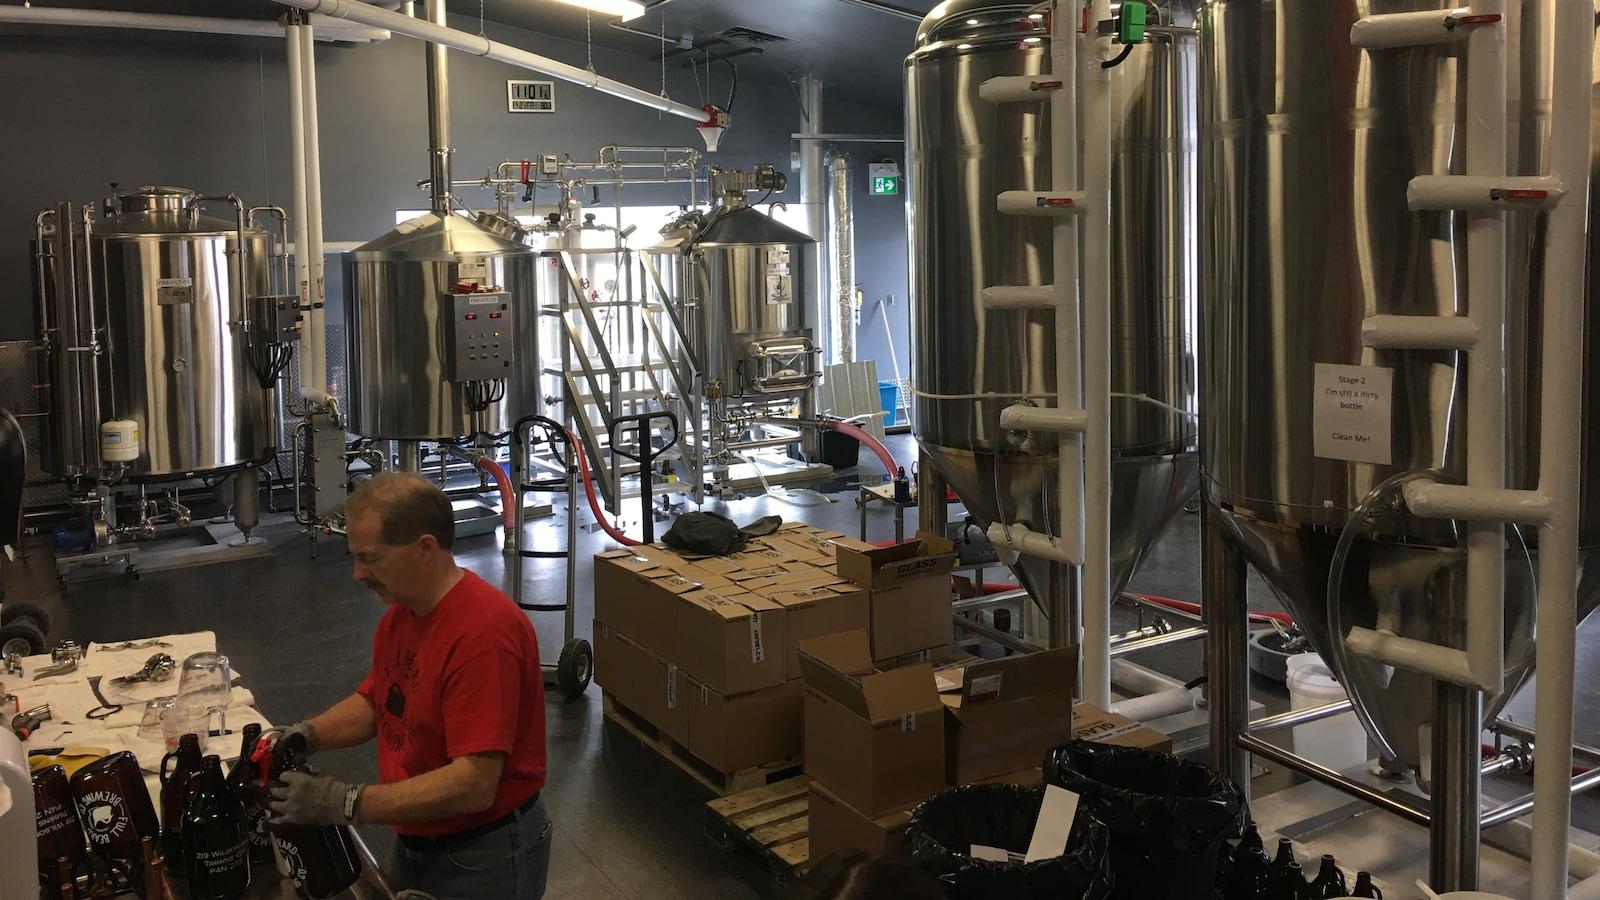 La microbrasserie Full Beard Brewing de Timmins fabrique sept sortes de bières.